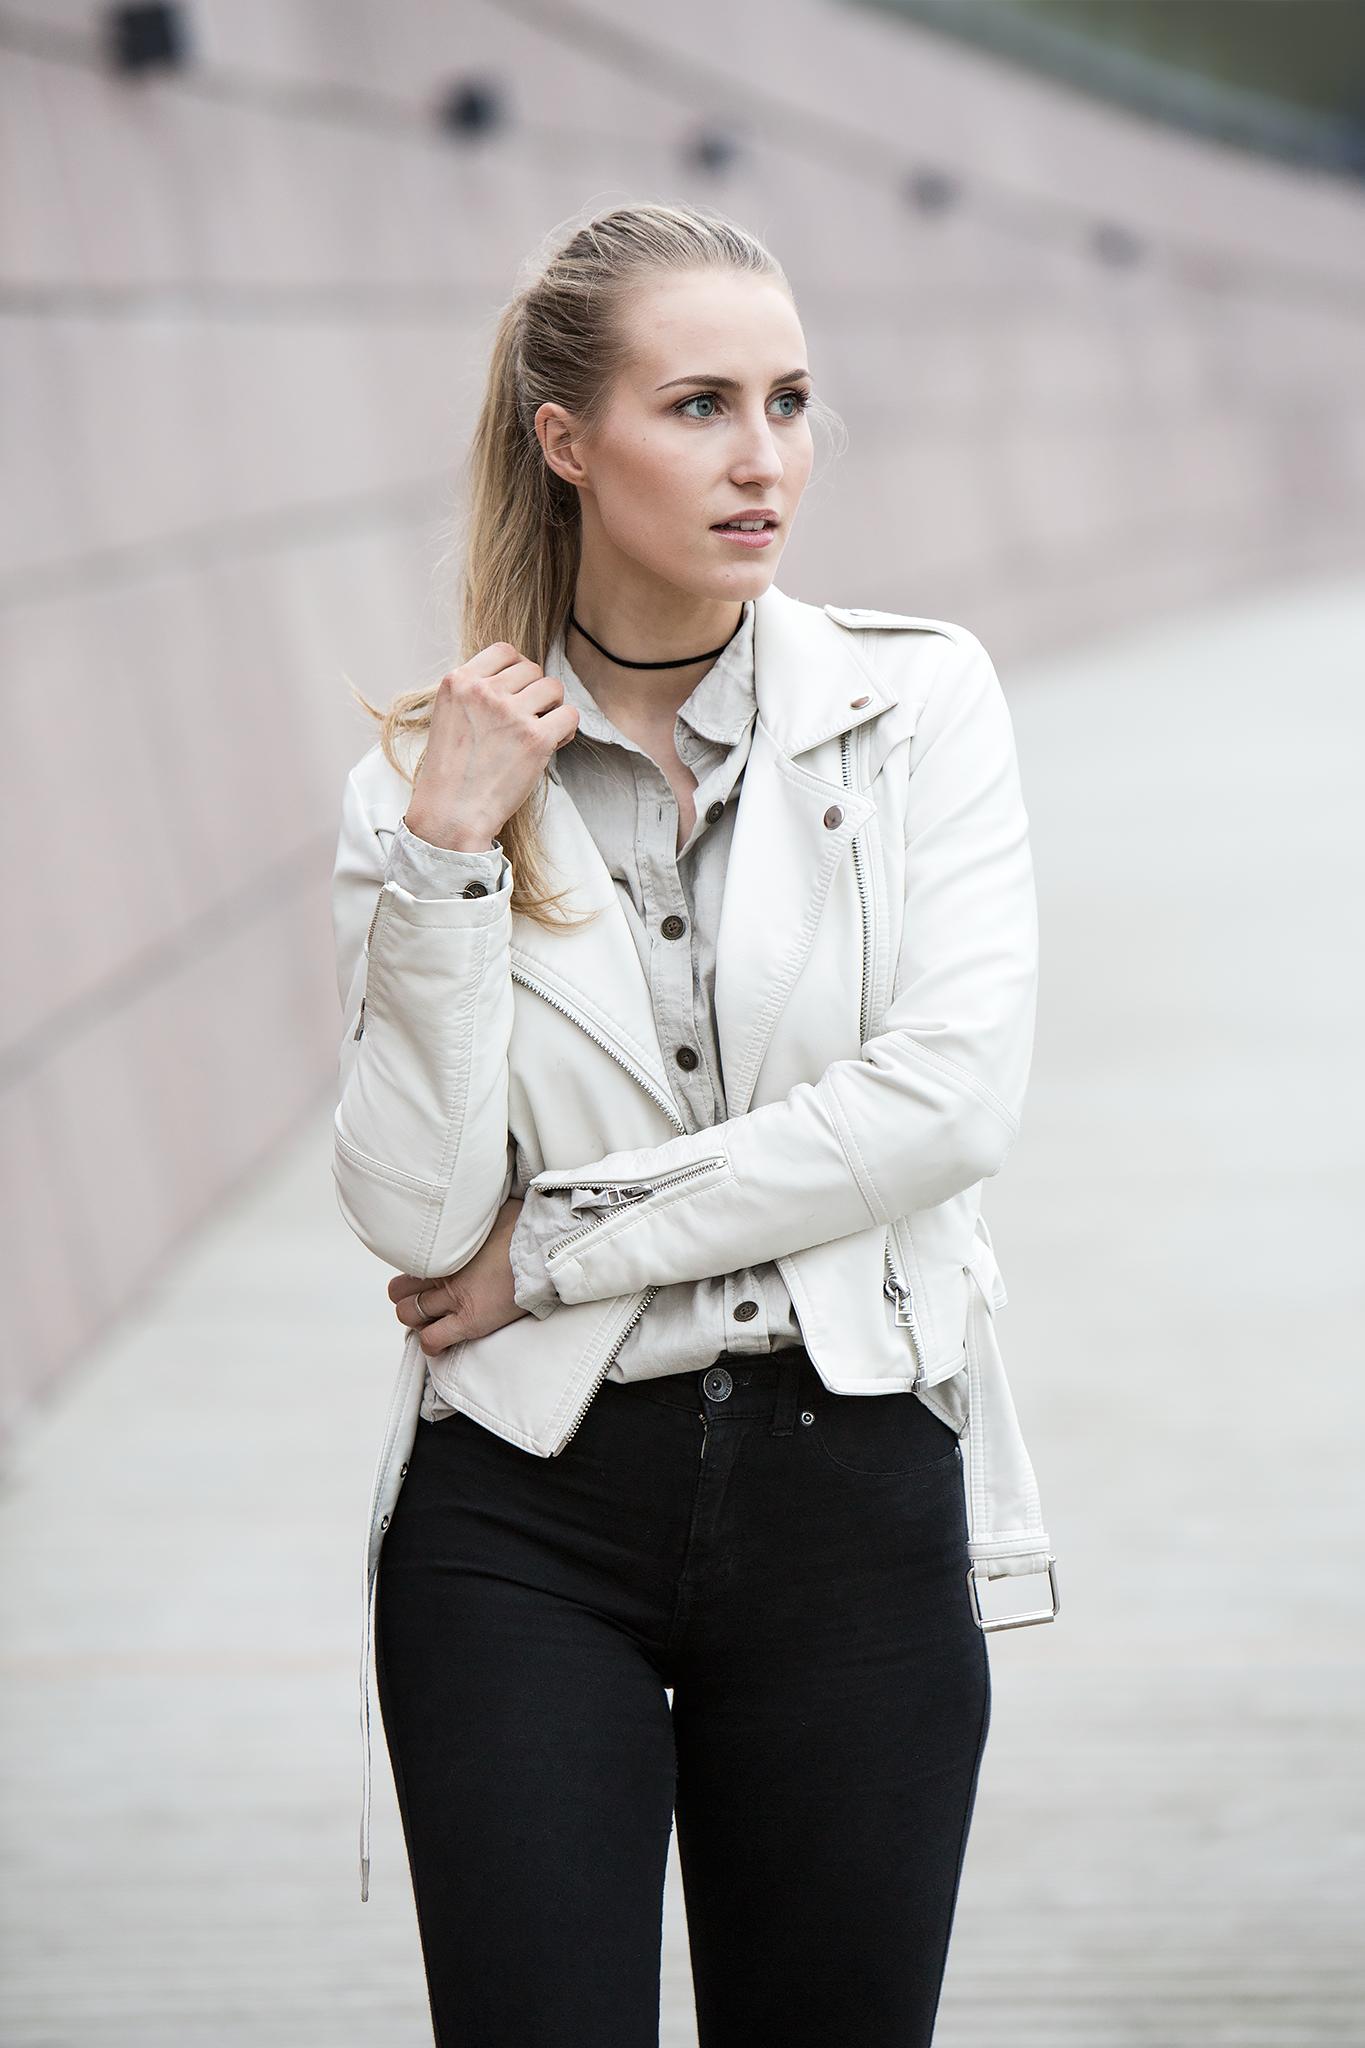 Fashion by SandraEmilia